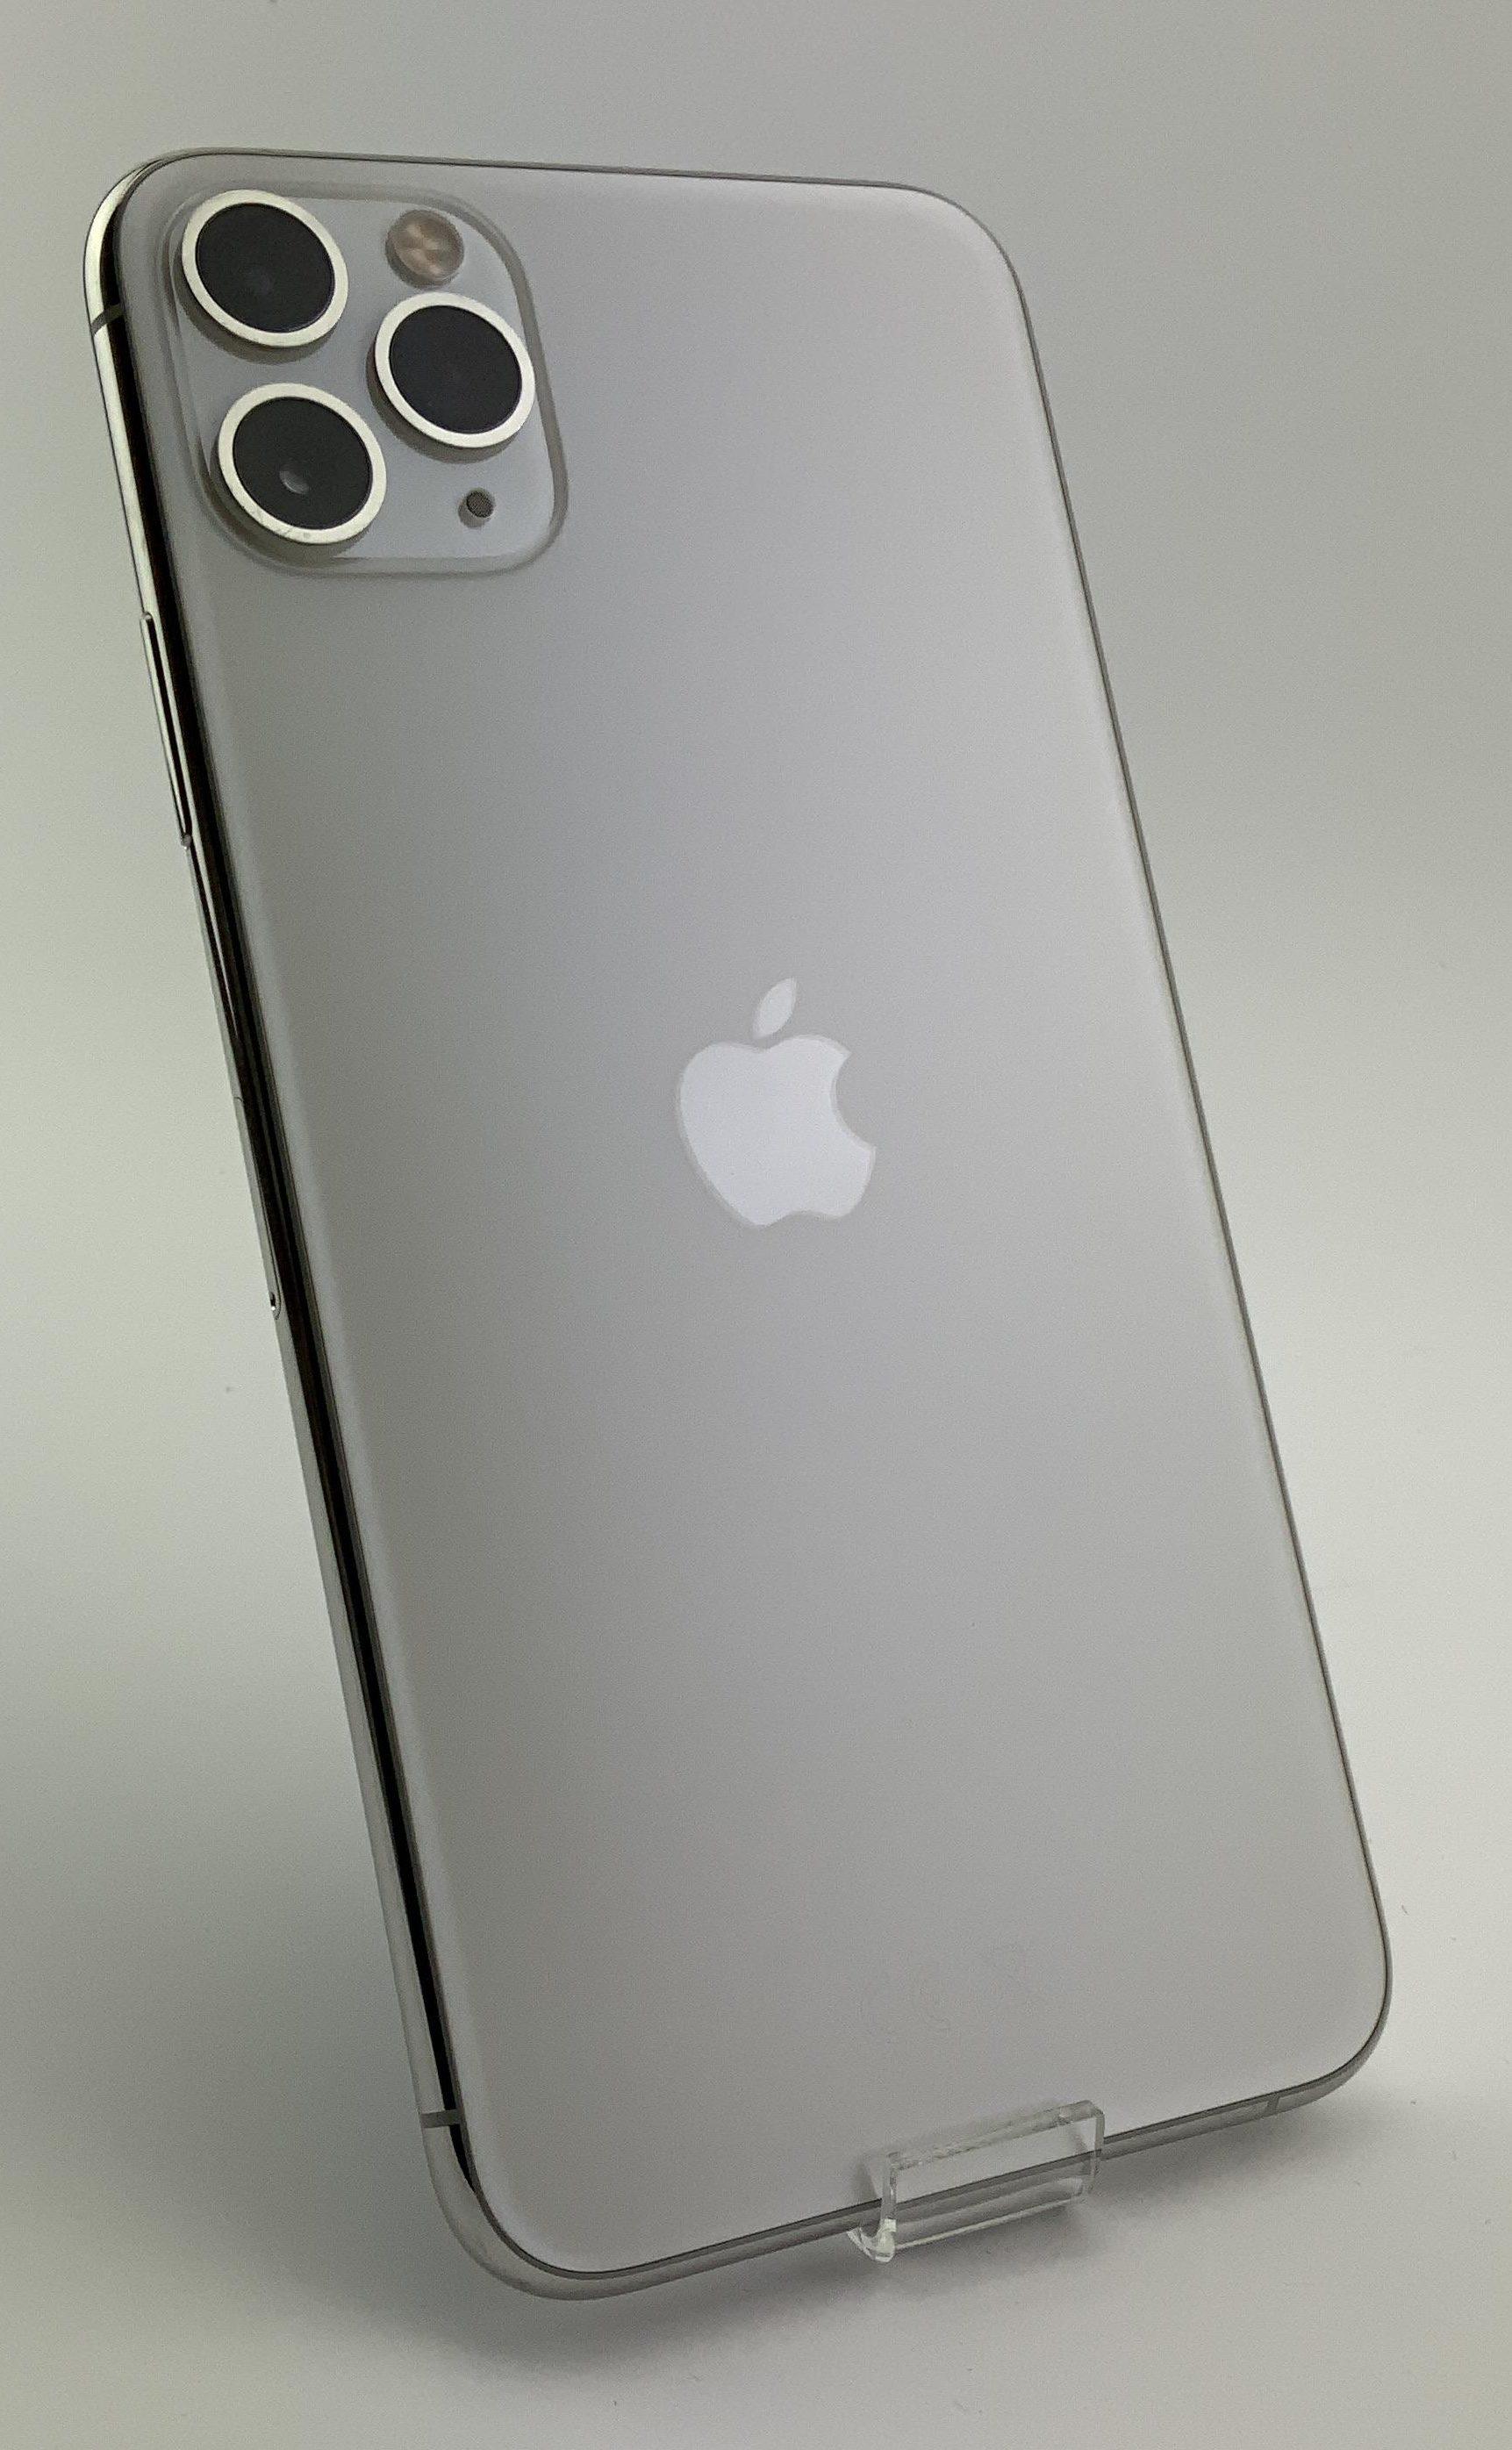 iPhone 11 Pro Max 64GB, 64GB, Gold, bild 2